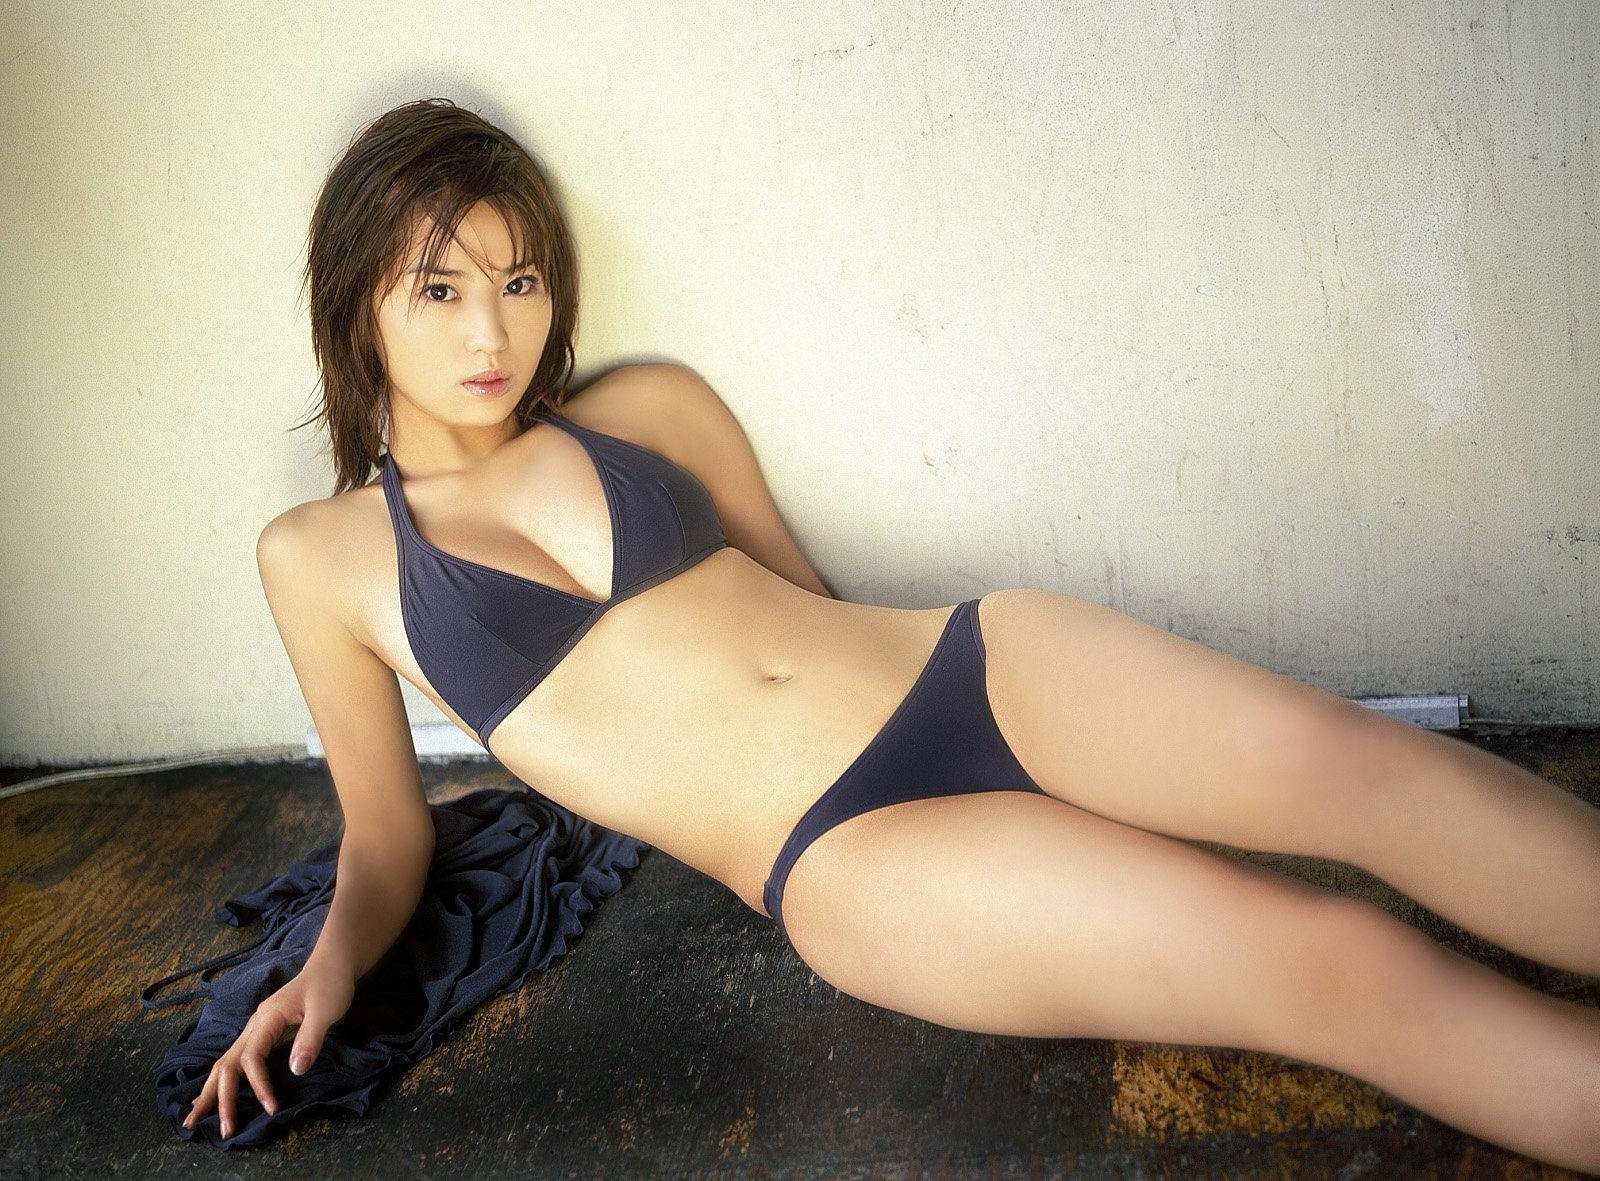 Sexy Japanese Yui Ishikawa in a soft bikini topYui Ishikawa